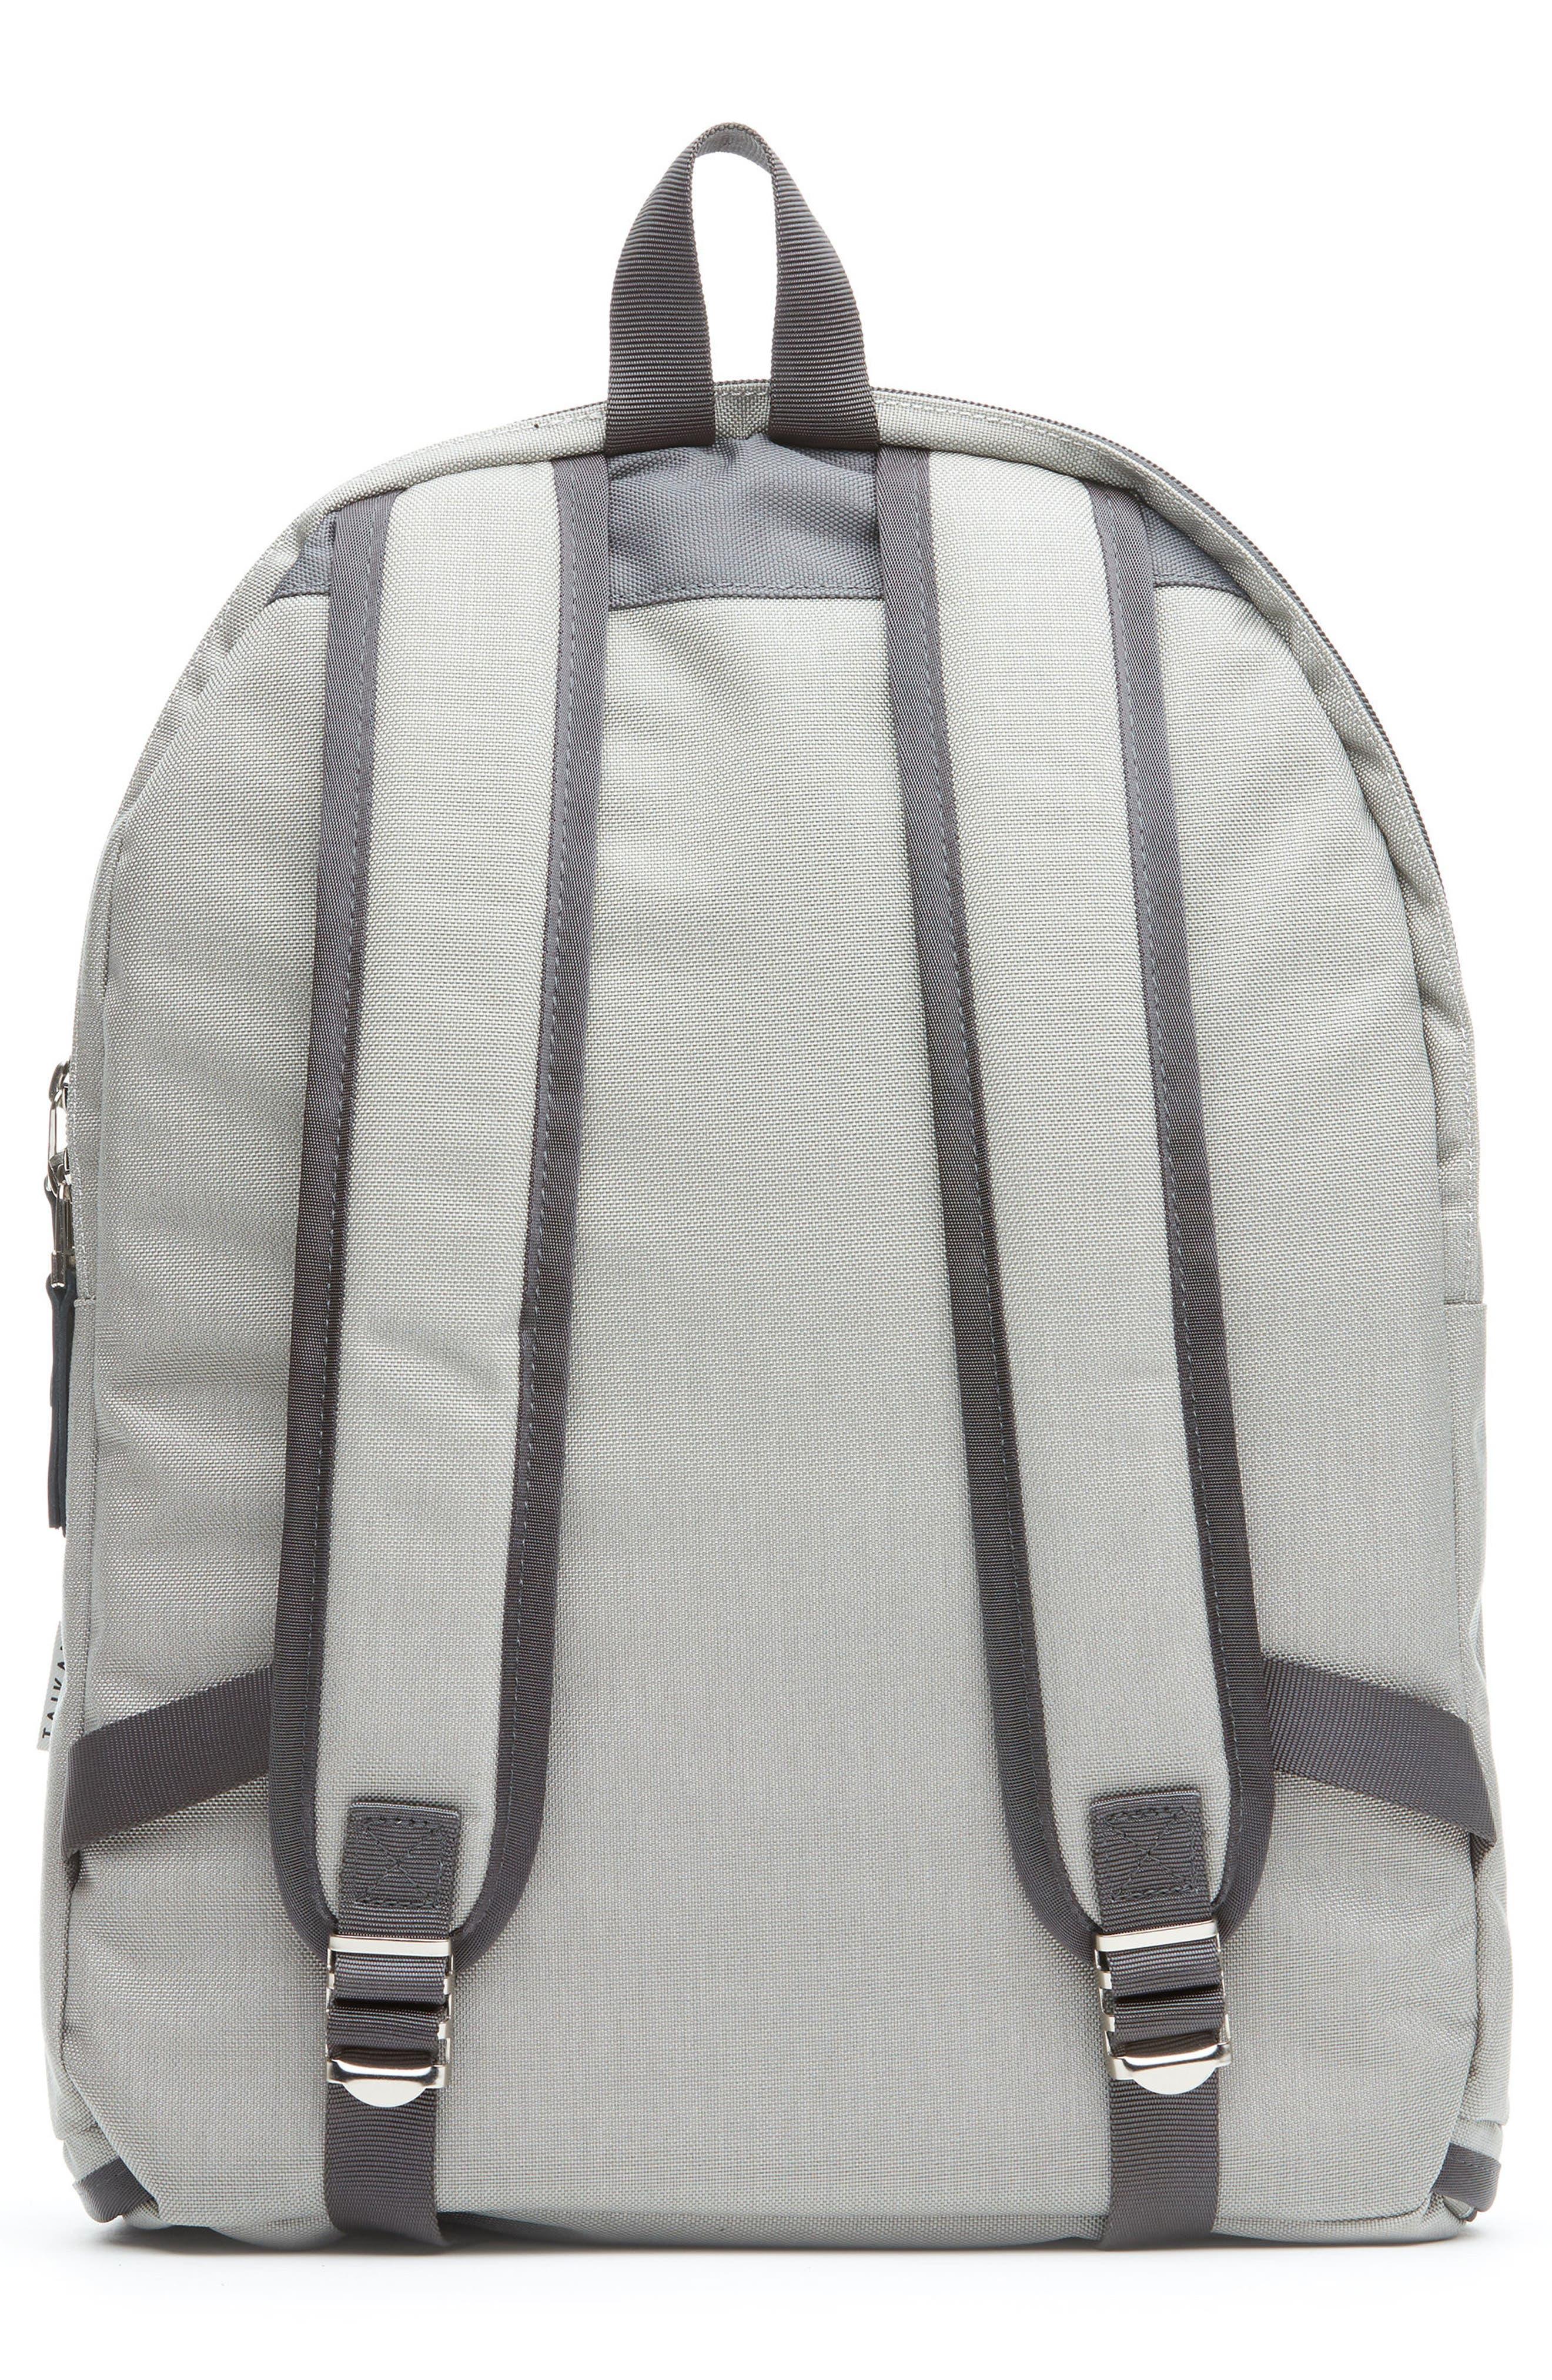 TAIKAN,                             Spartan Backpack,                             Alternate thumbnail 2, color,                             GREY/ GREY